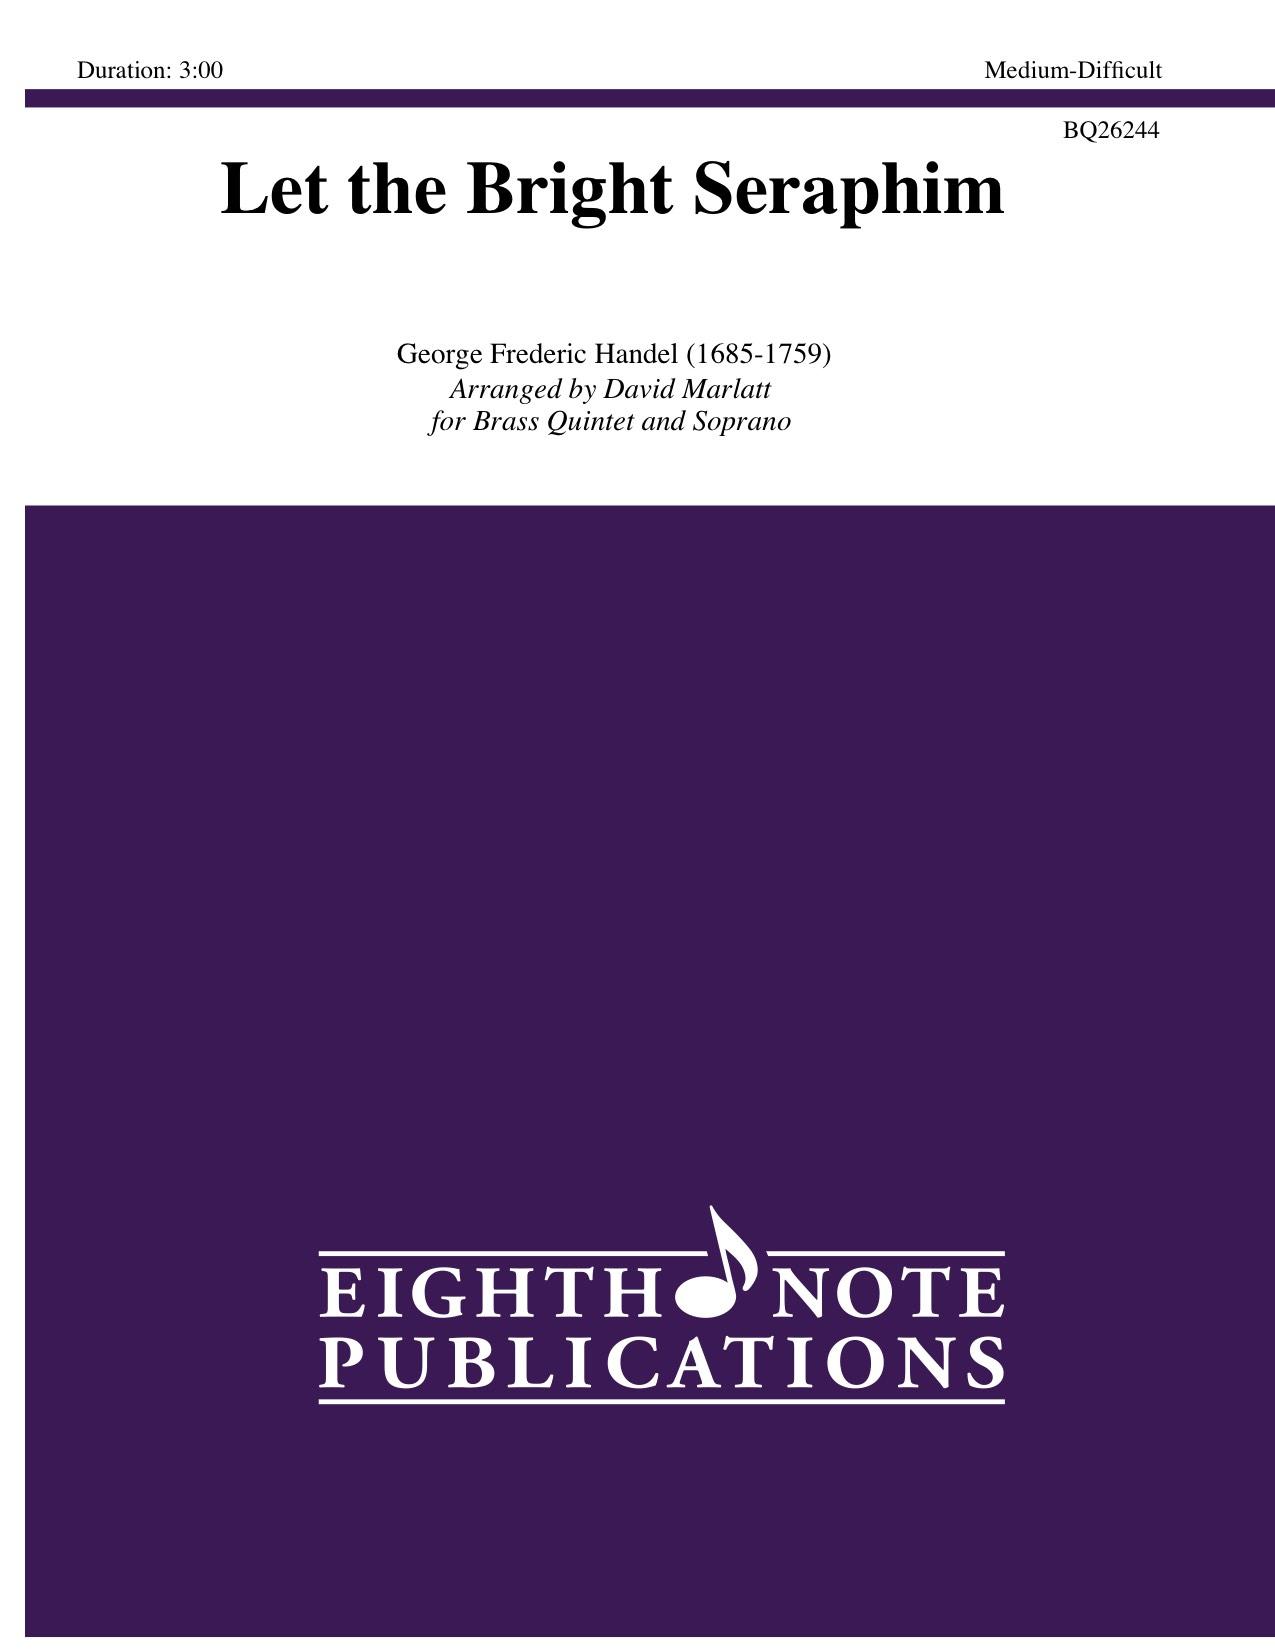 Let the Bright Seraphim - George Frederic Handel